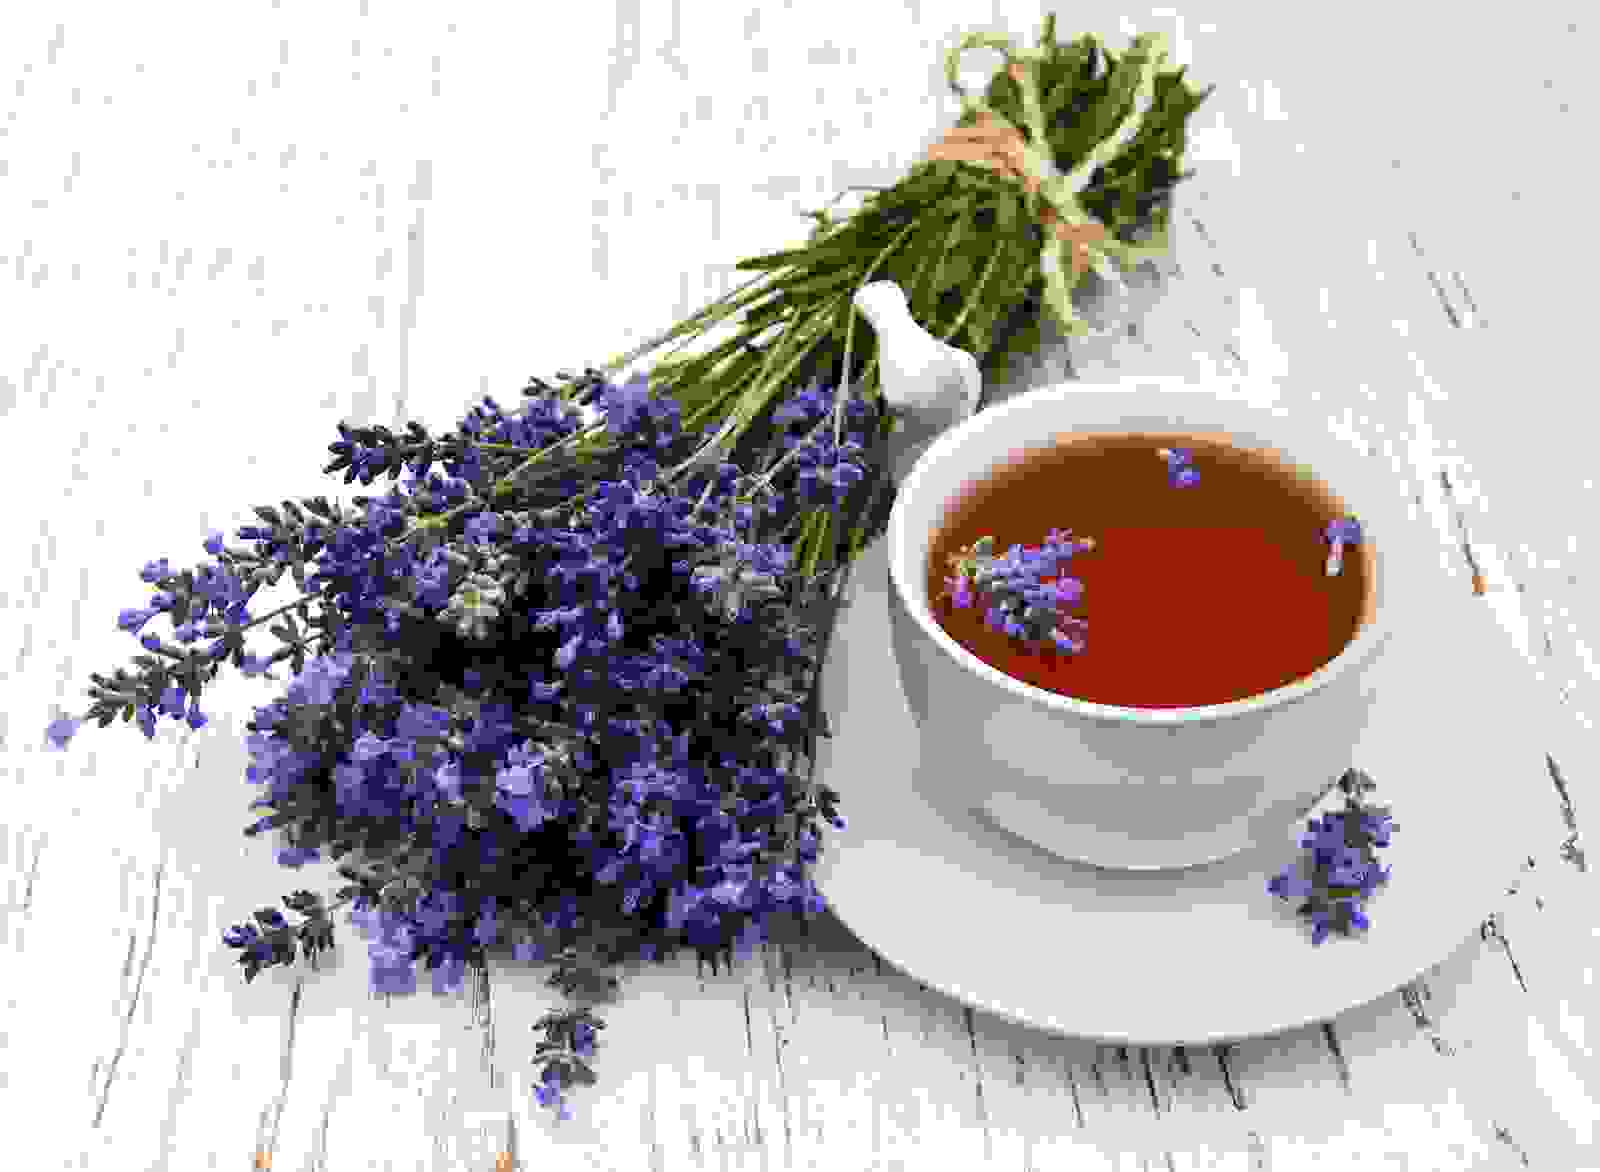 شاي اللافندر